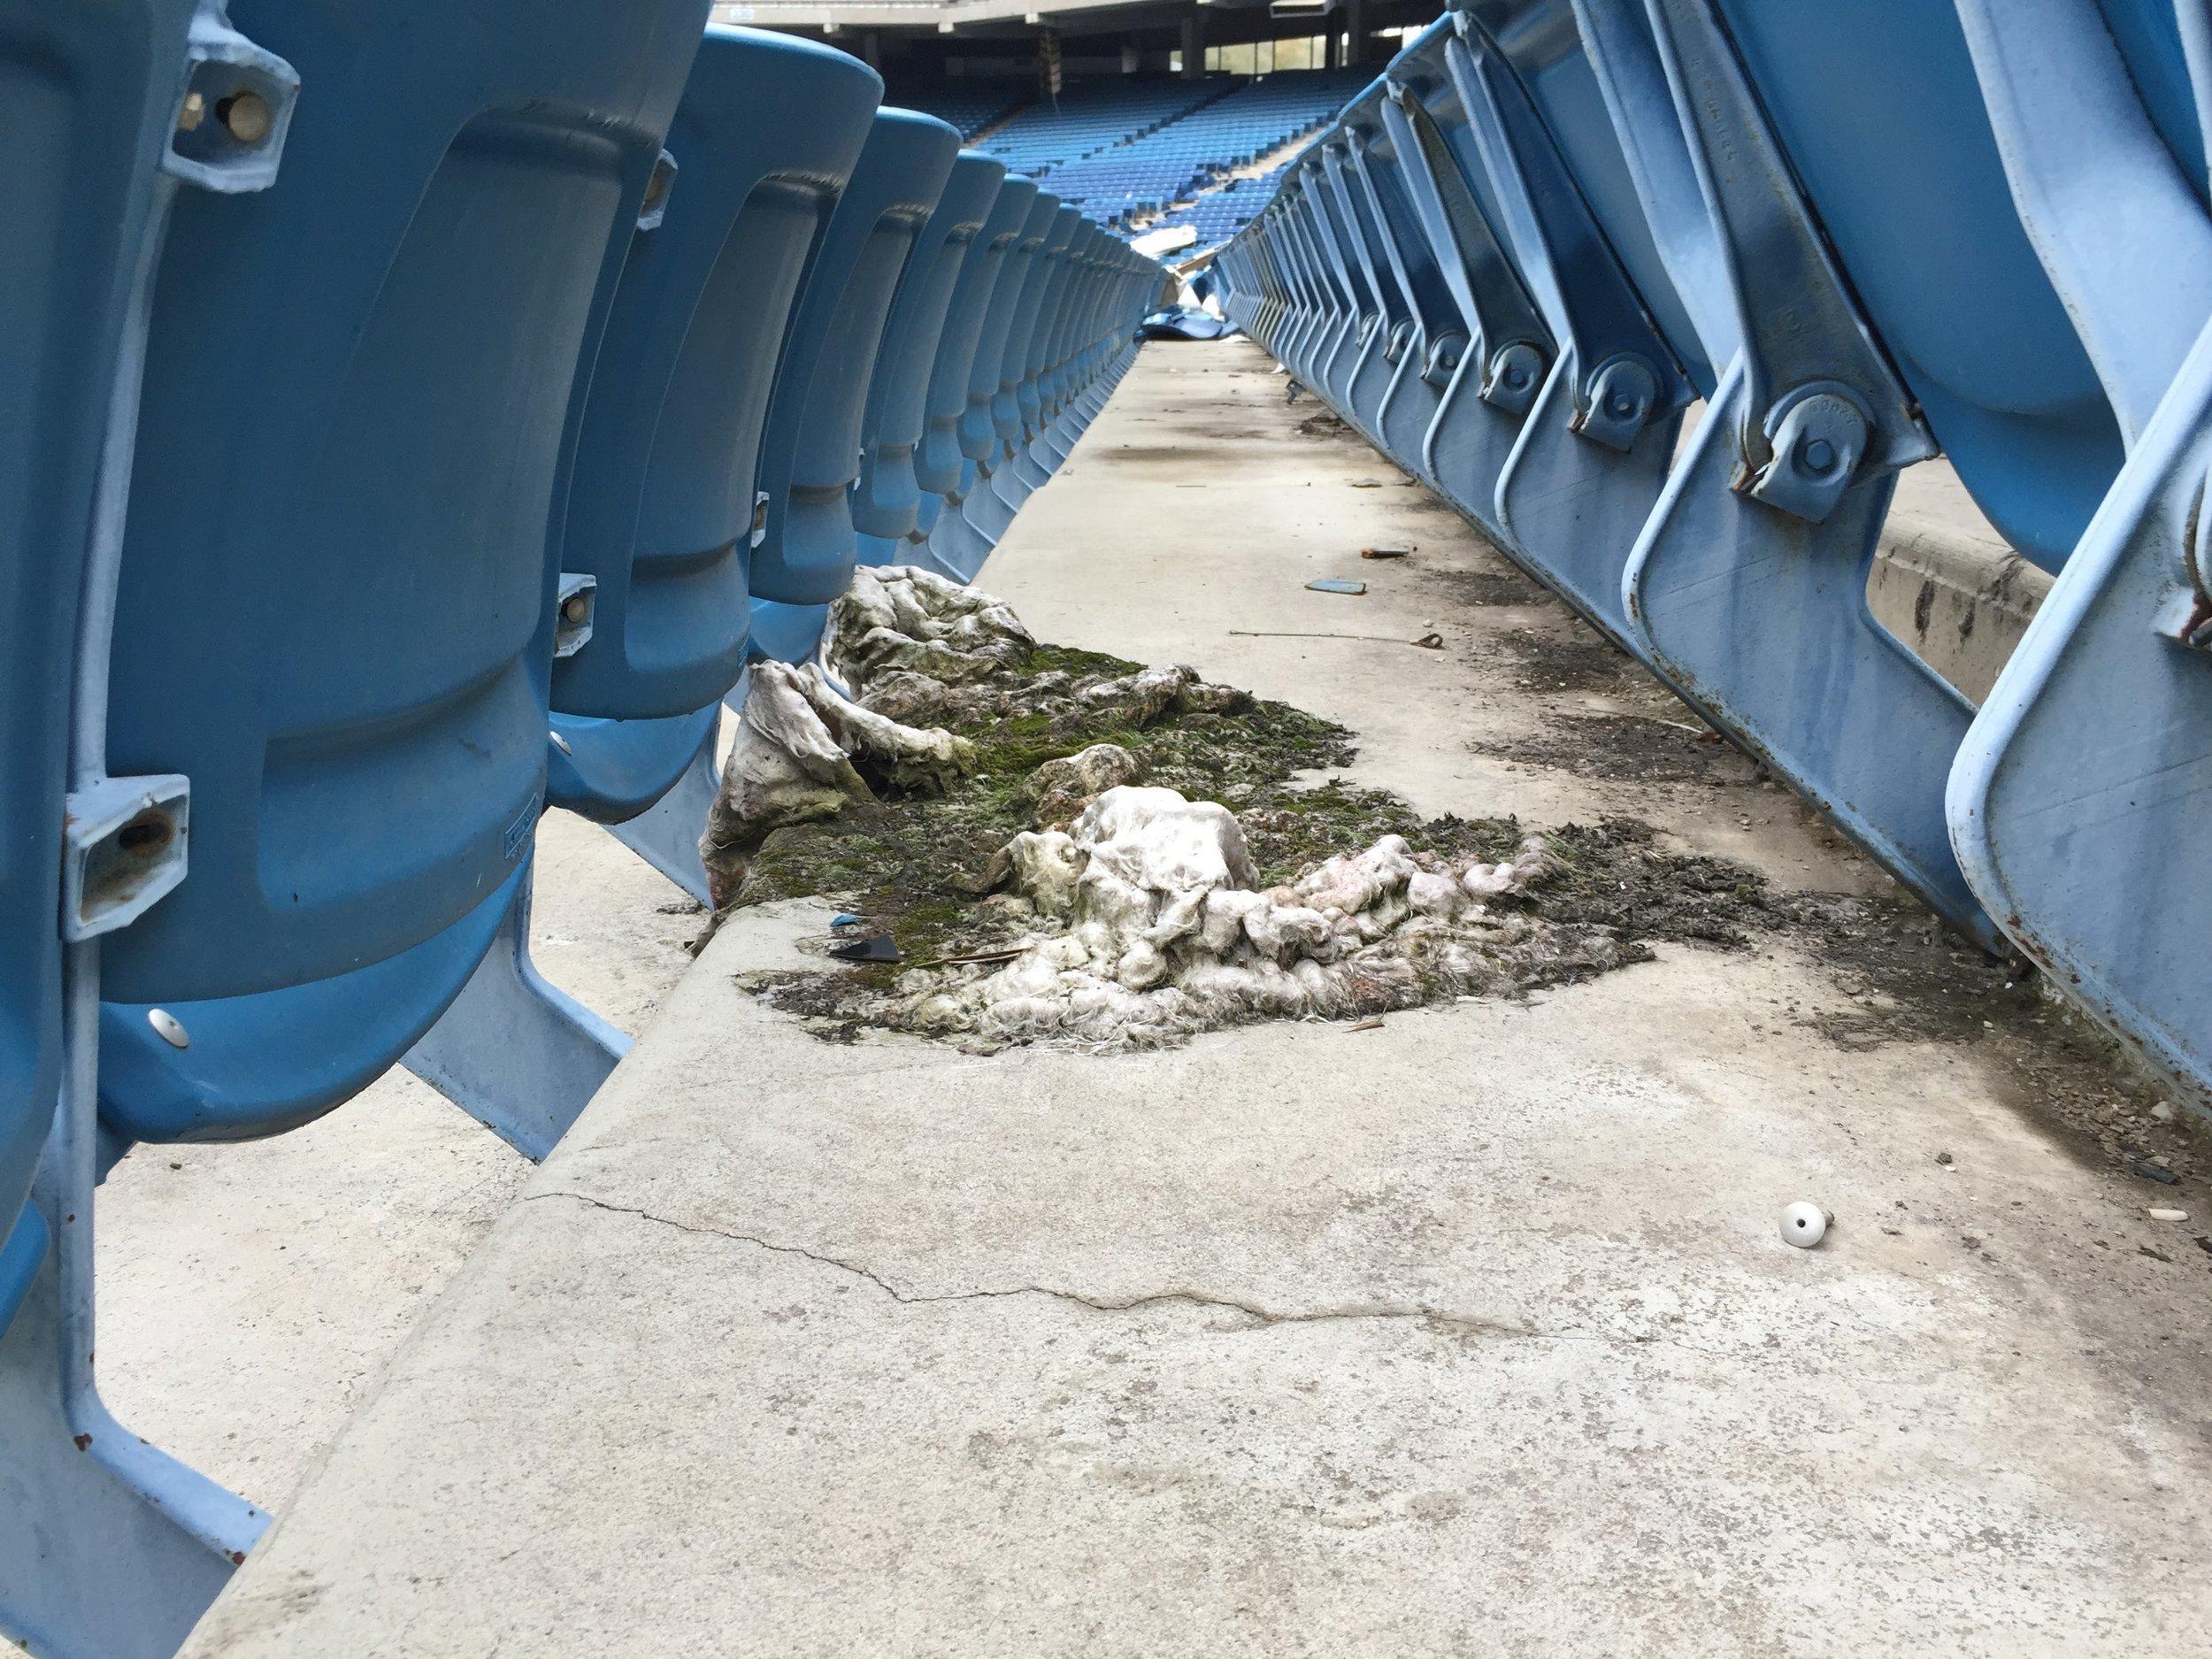 Silverdome (Pontiac, MI)